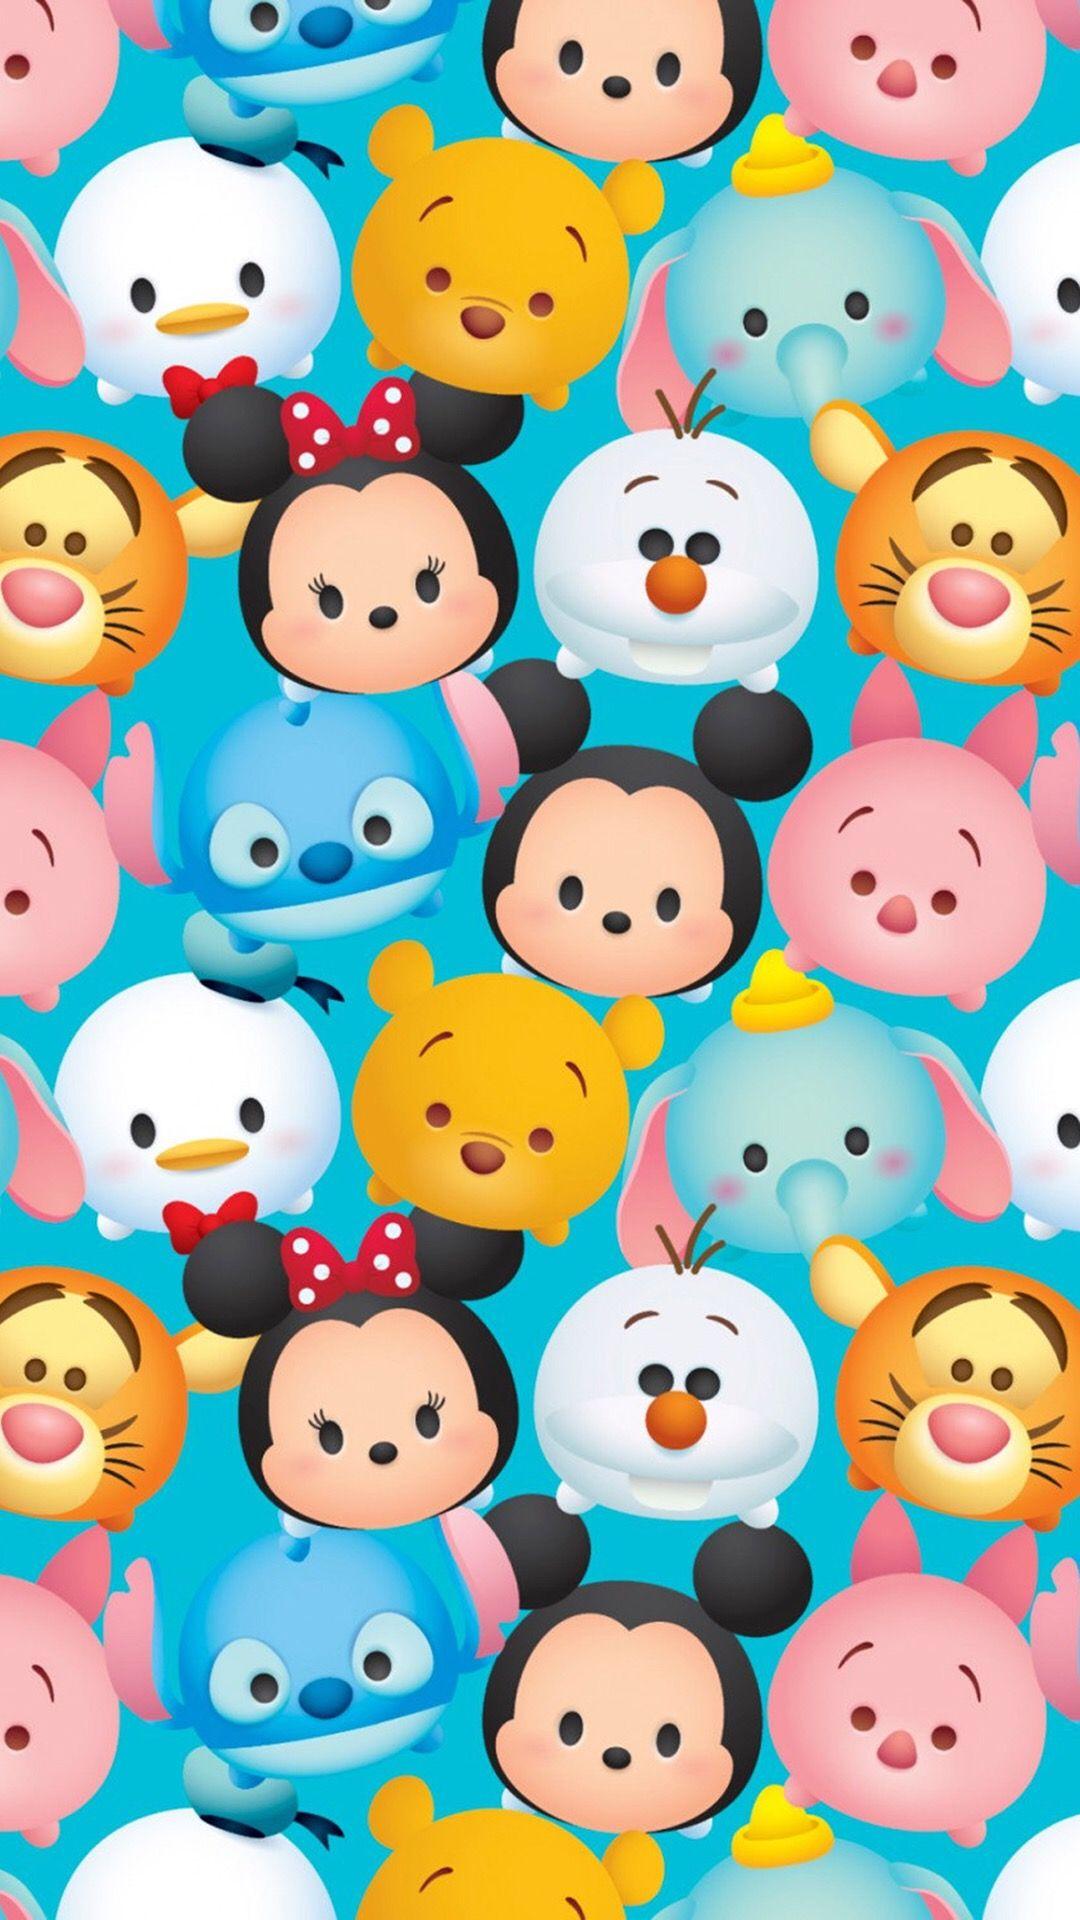 Pin Oleh Yummy Chocolate Di Disney Wallpaper Disney Wallpaper Lucu Lukisan Disney